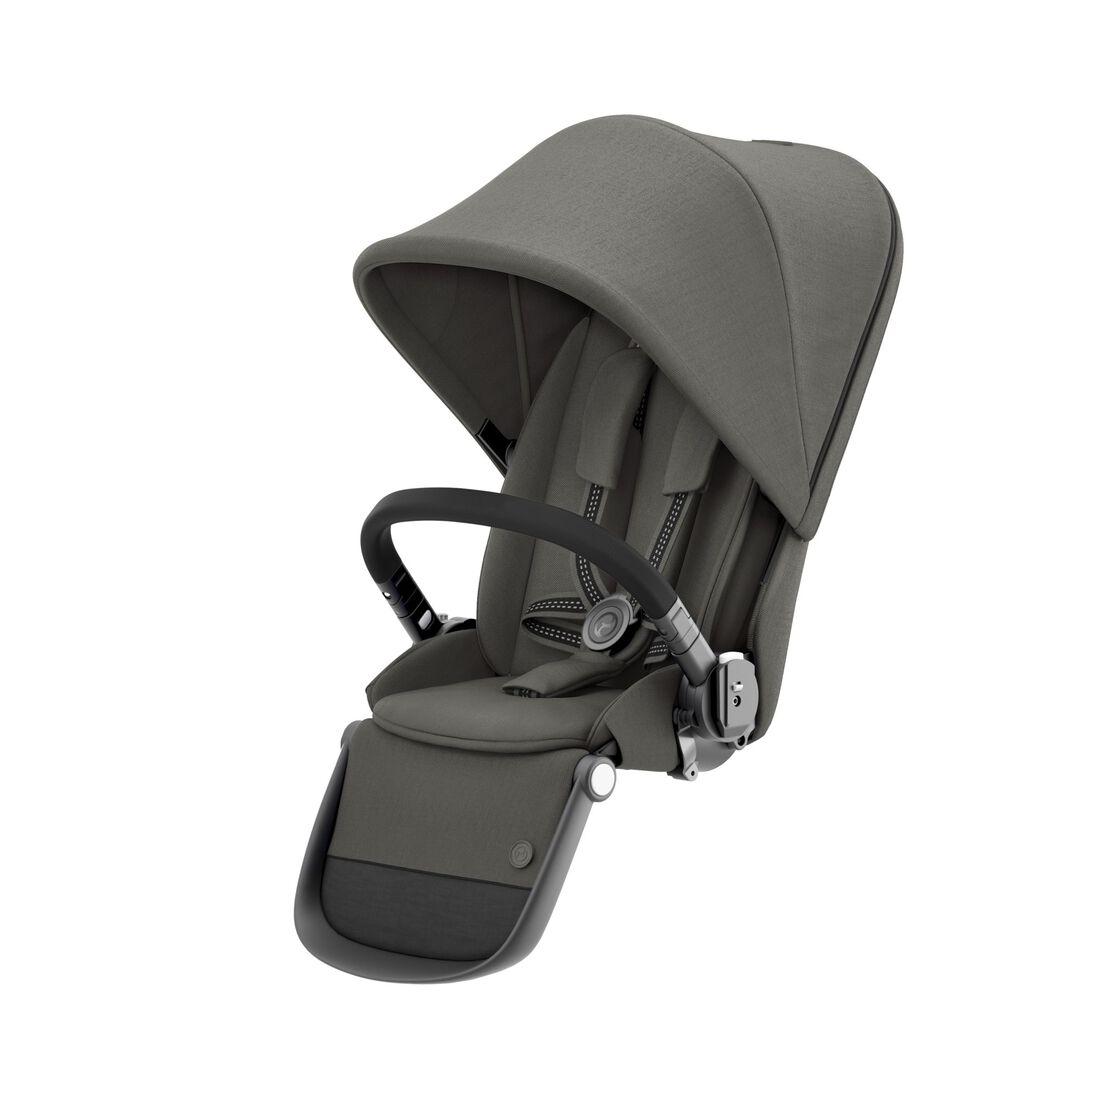 CYBEX Gazelle S Sitzeinheit - Soho Grey (Schwarzer Rahmen) in Soho Grey (Black Frame) large Bild 1